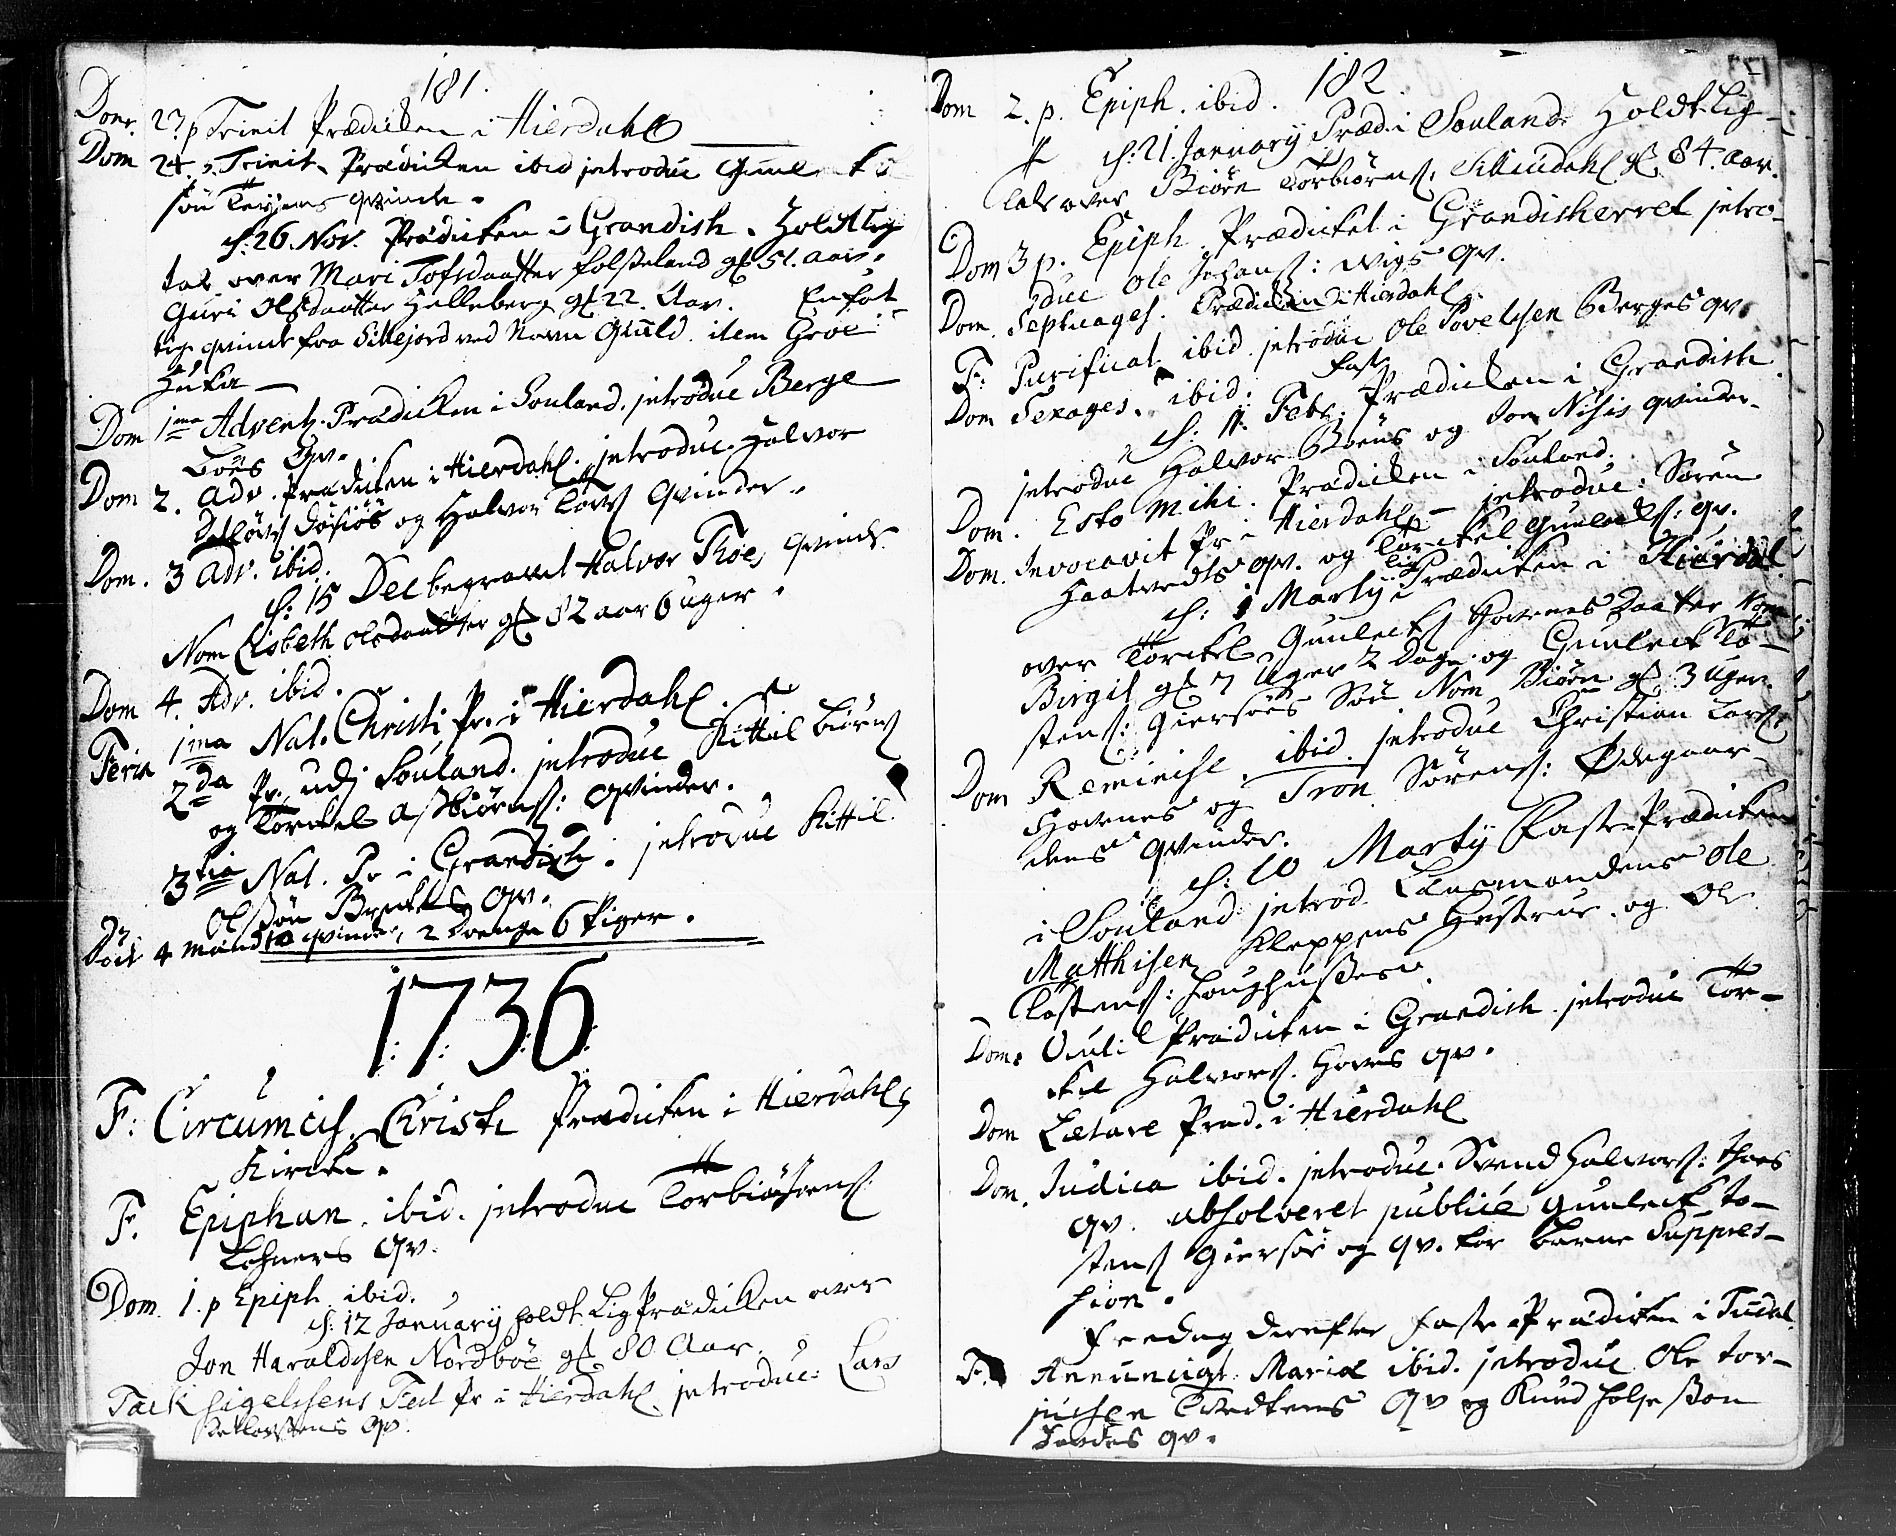 SAKO, Hjartdal kirkebøker, F/Fa/L0002: Ministerialbok nr. I 2, 1716-1754, s. 181-182